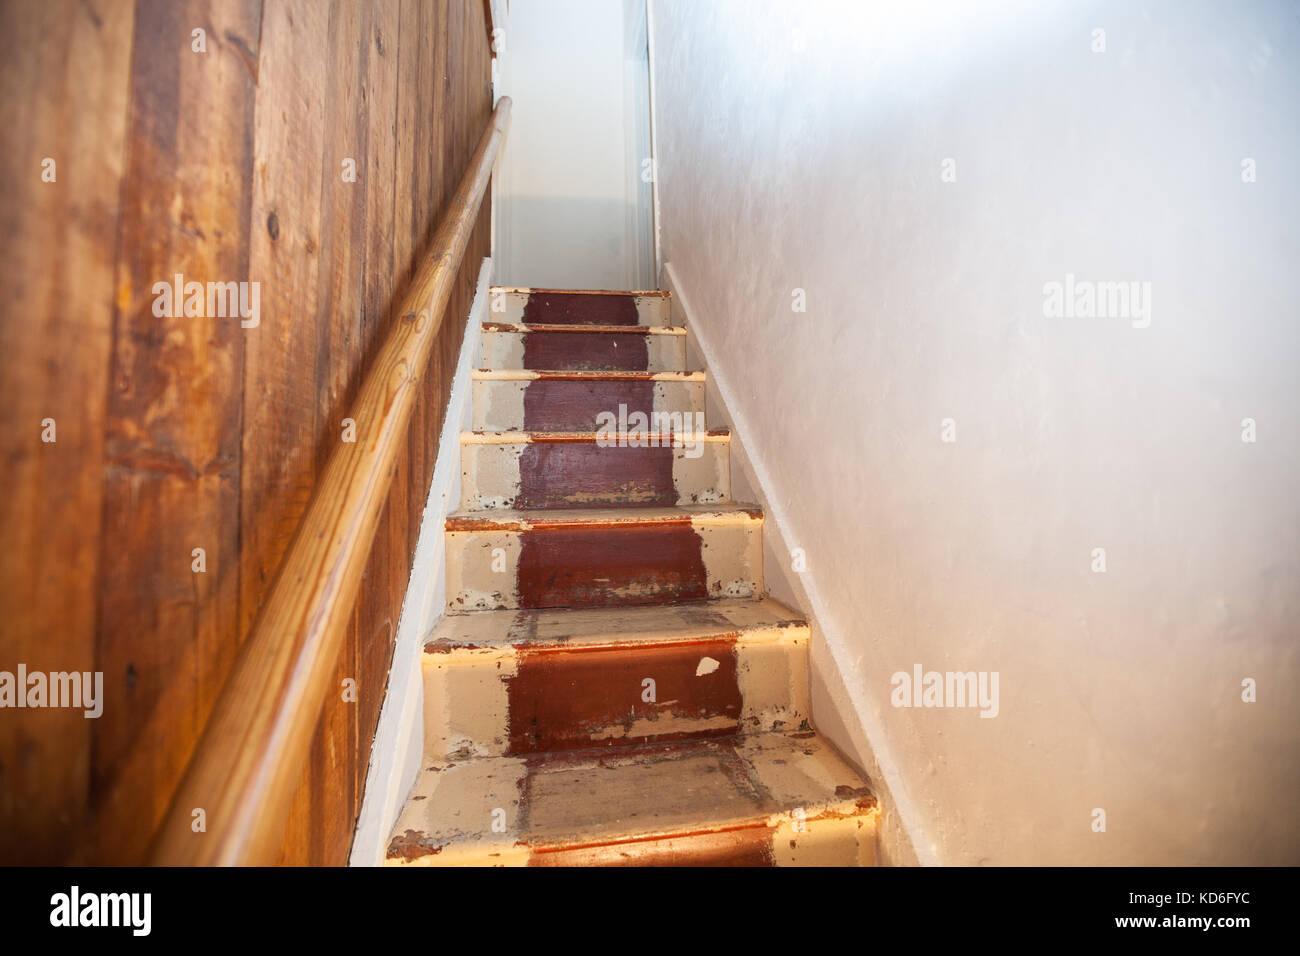 property release, mein haus treppen, renovierung, do it yourself